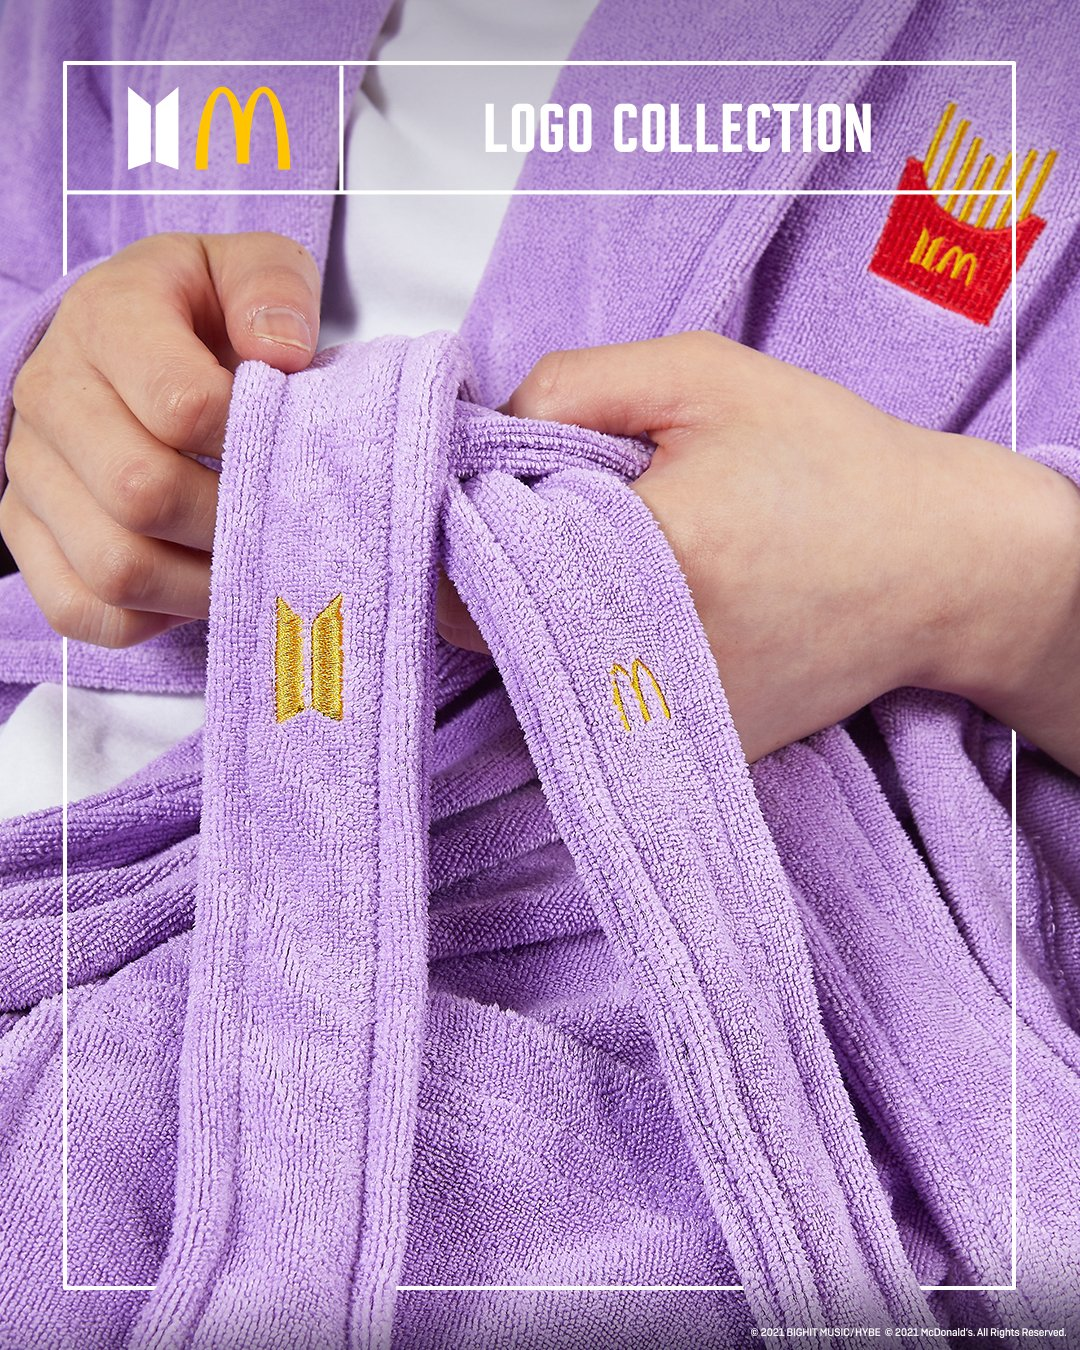 Merchandis edisi terbatas McDonald's x BTS.